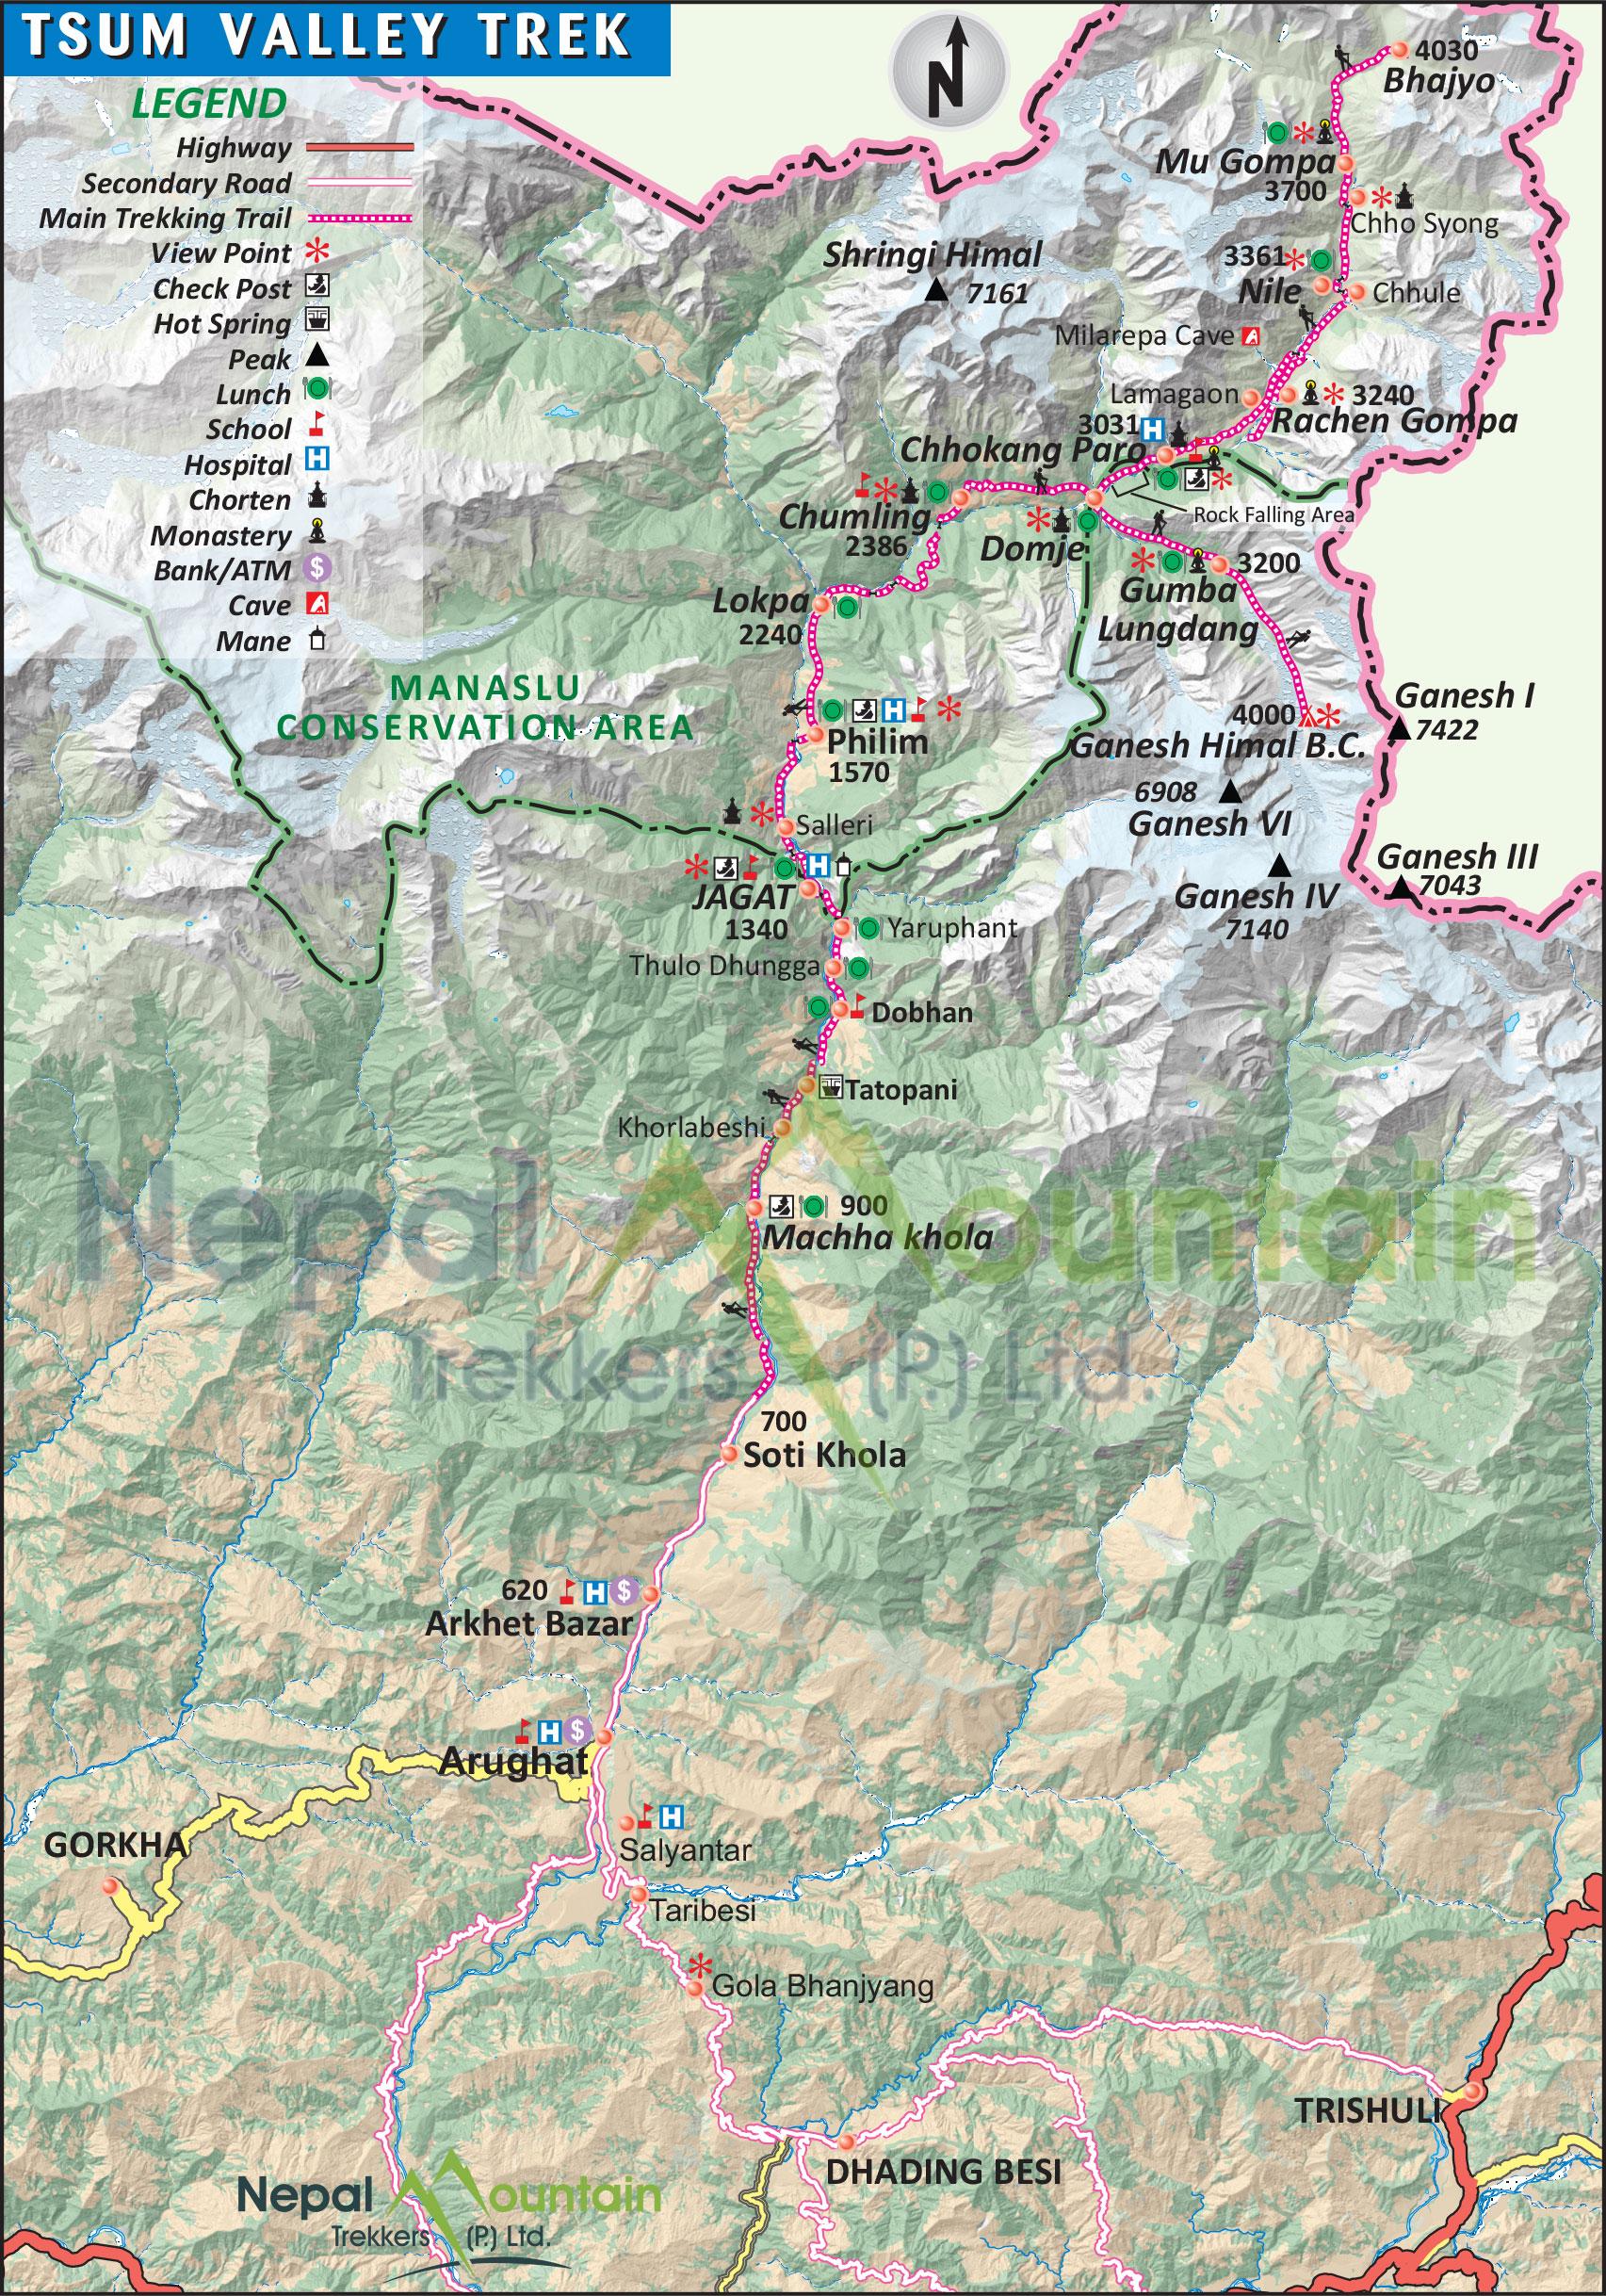 map of Tsum Valley Trek